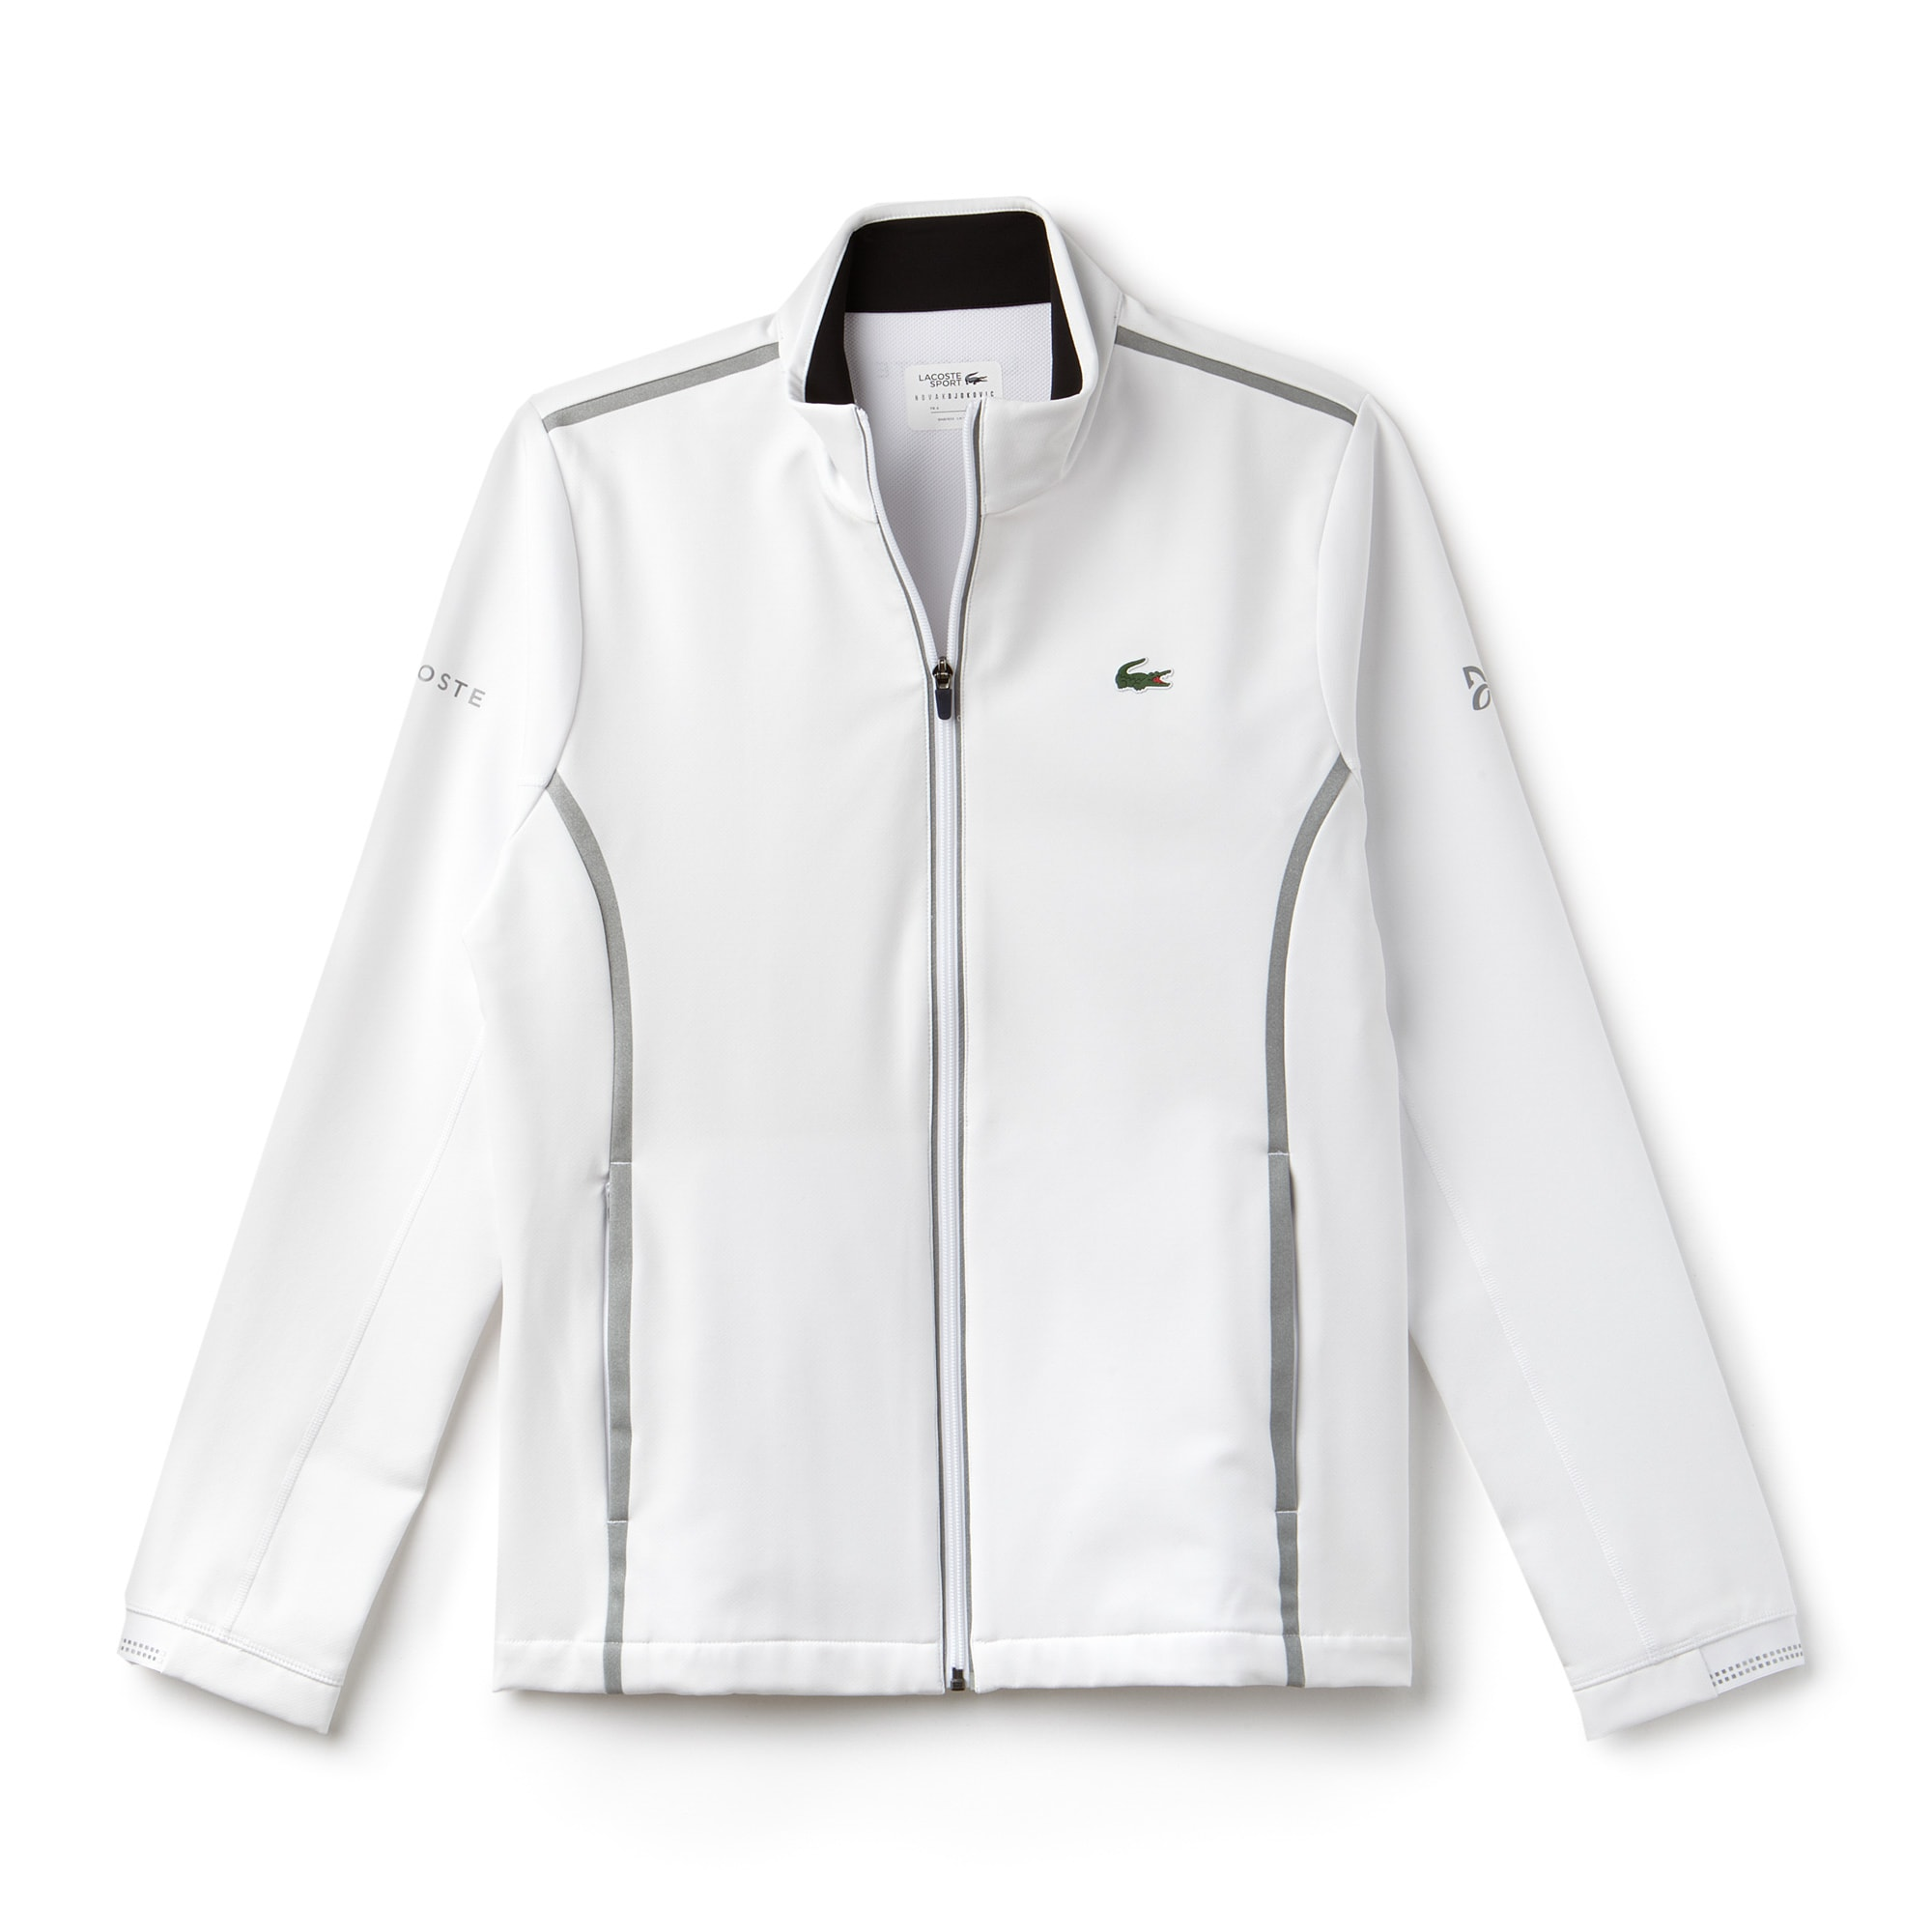 Sudadera Con Cremallera Lacoste Sport Collection Novak Djokovic Support With Style De Midlayer Técnico